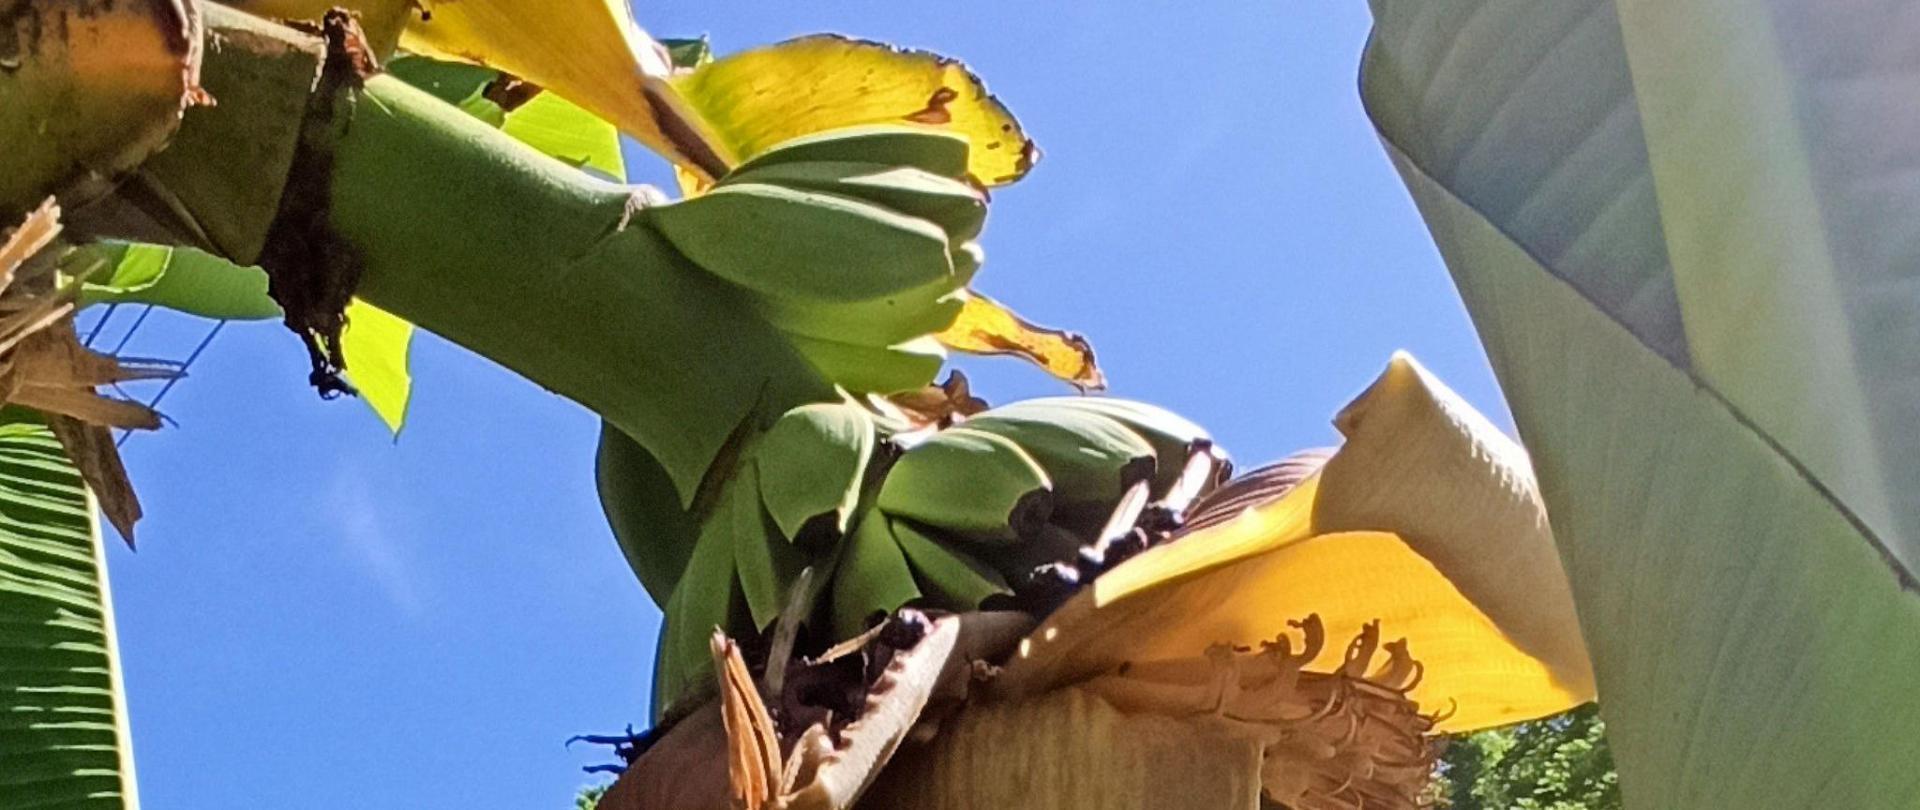 bananes 2.jpg